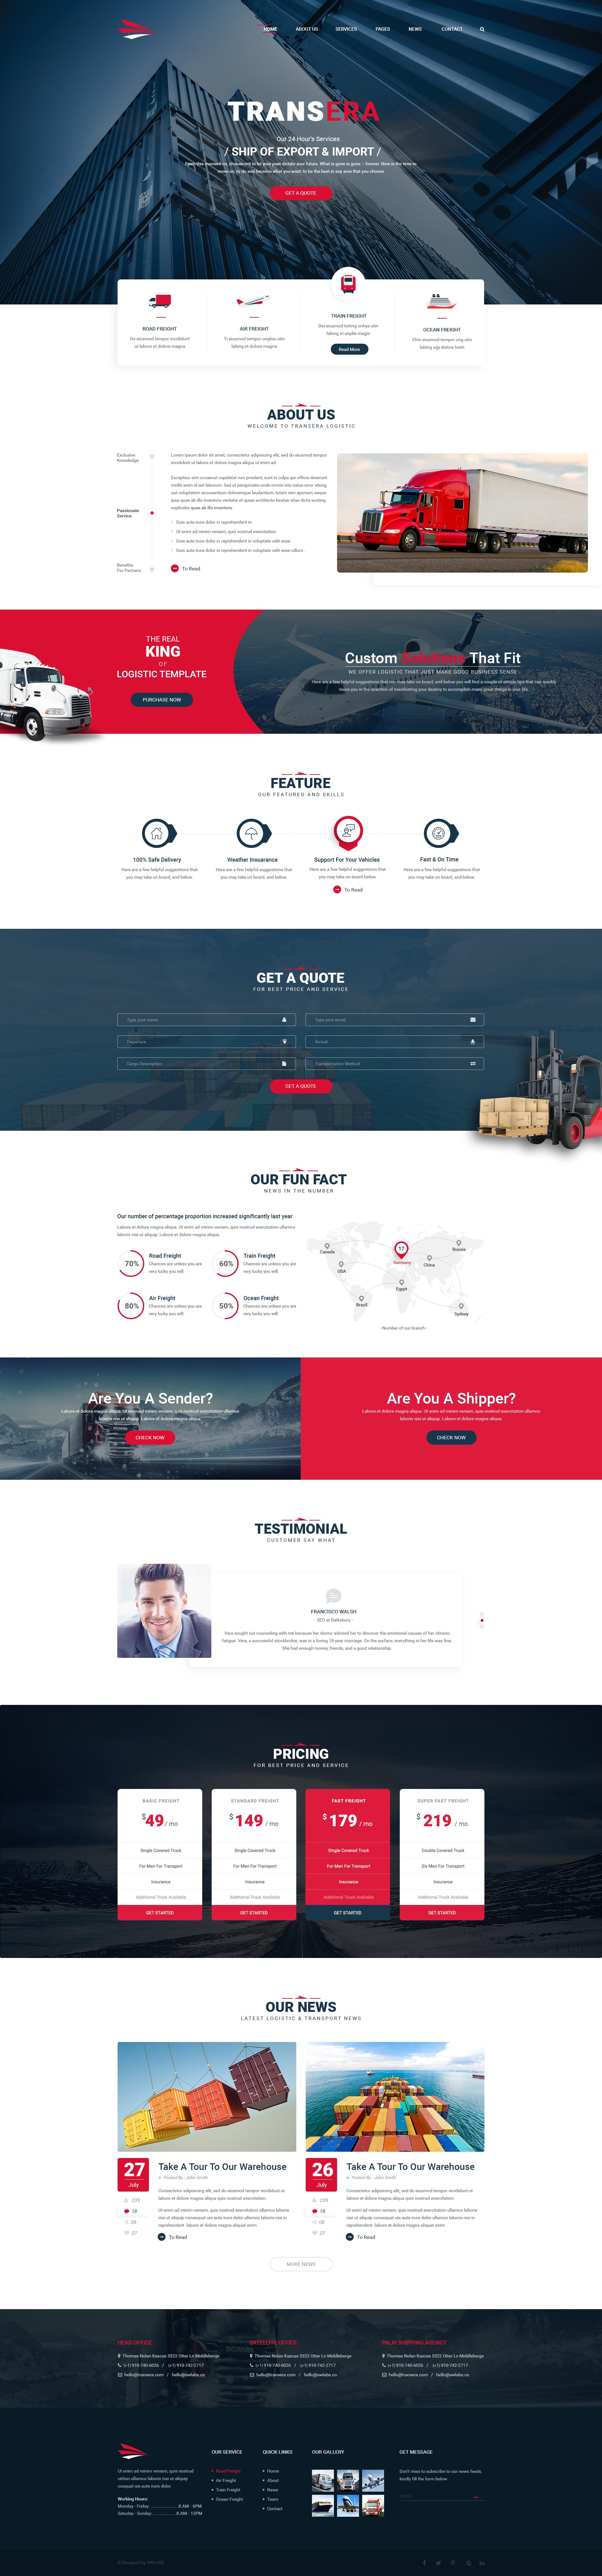 Transera Transportation Logistics Psd Template Download Https Themeforest Net Item Trans Corporate Web Design Web Layout Design Website Design Layout